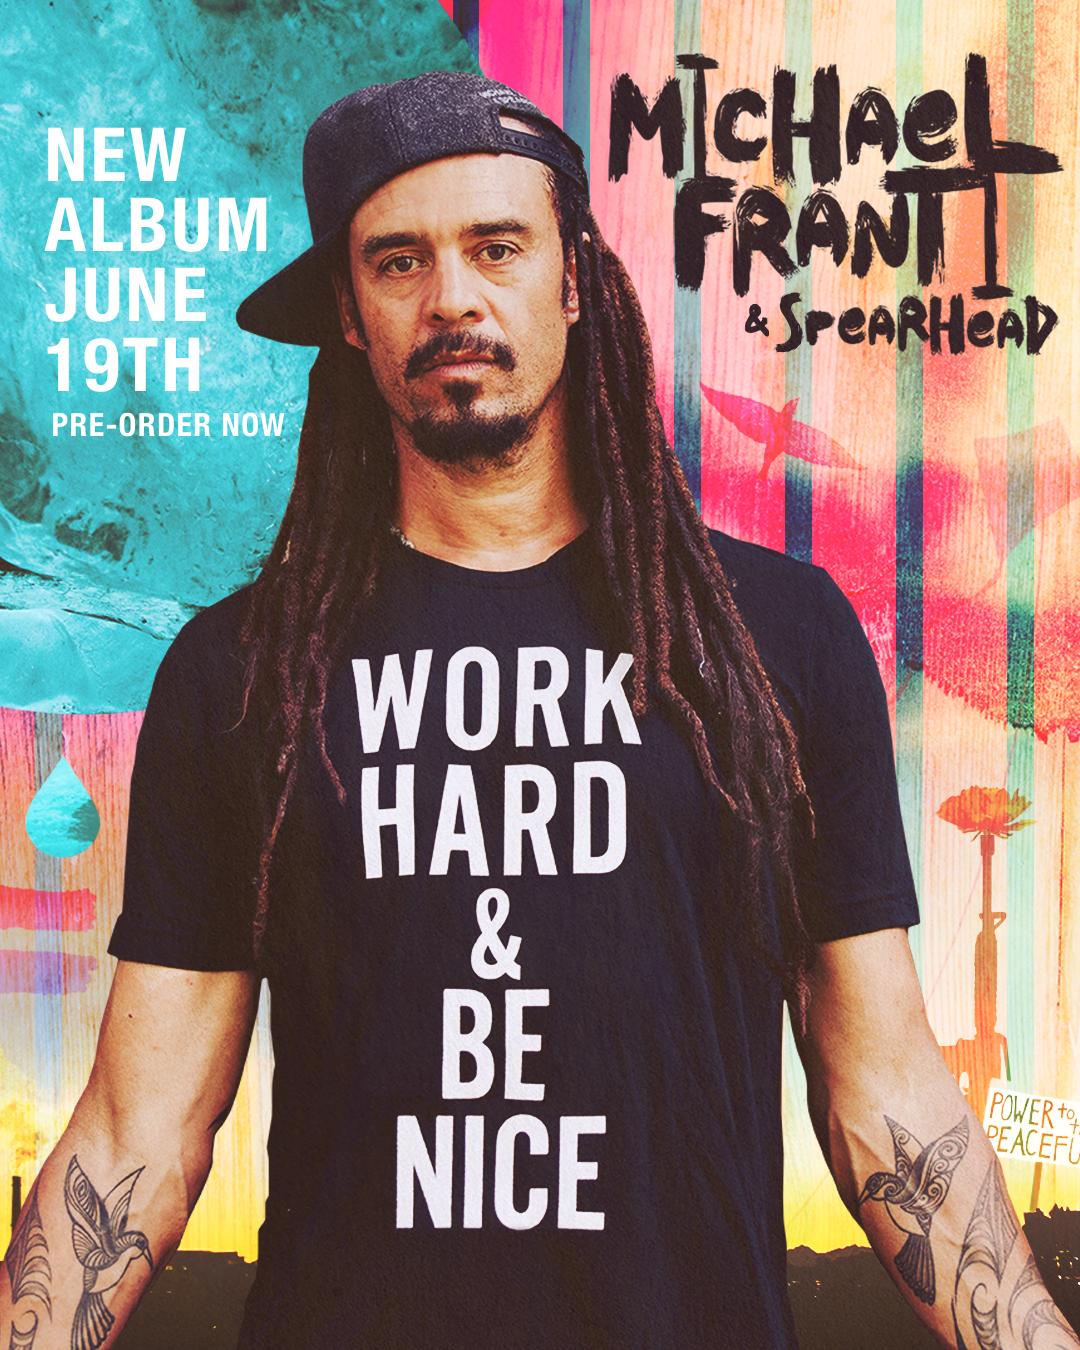 NEW ALBUM ALERT!!! Work Hard Be Nice